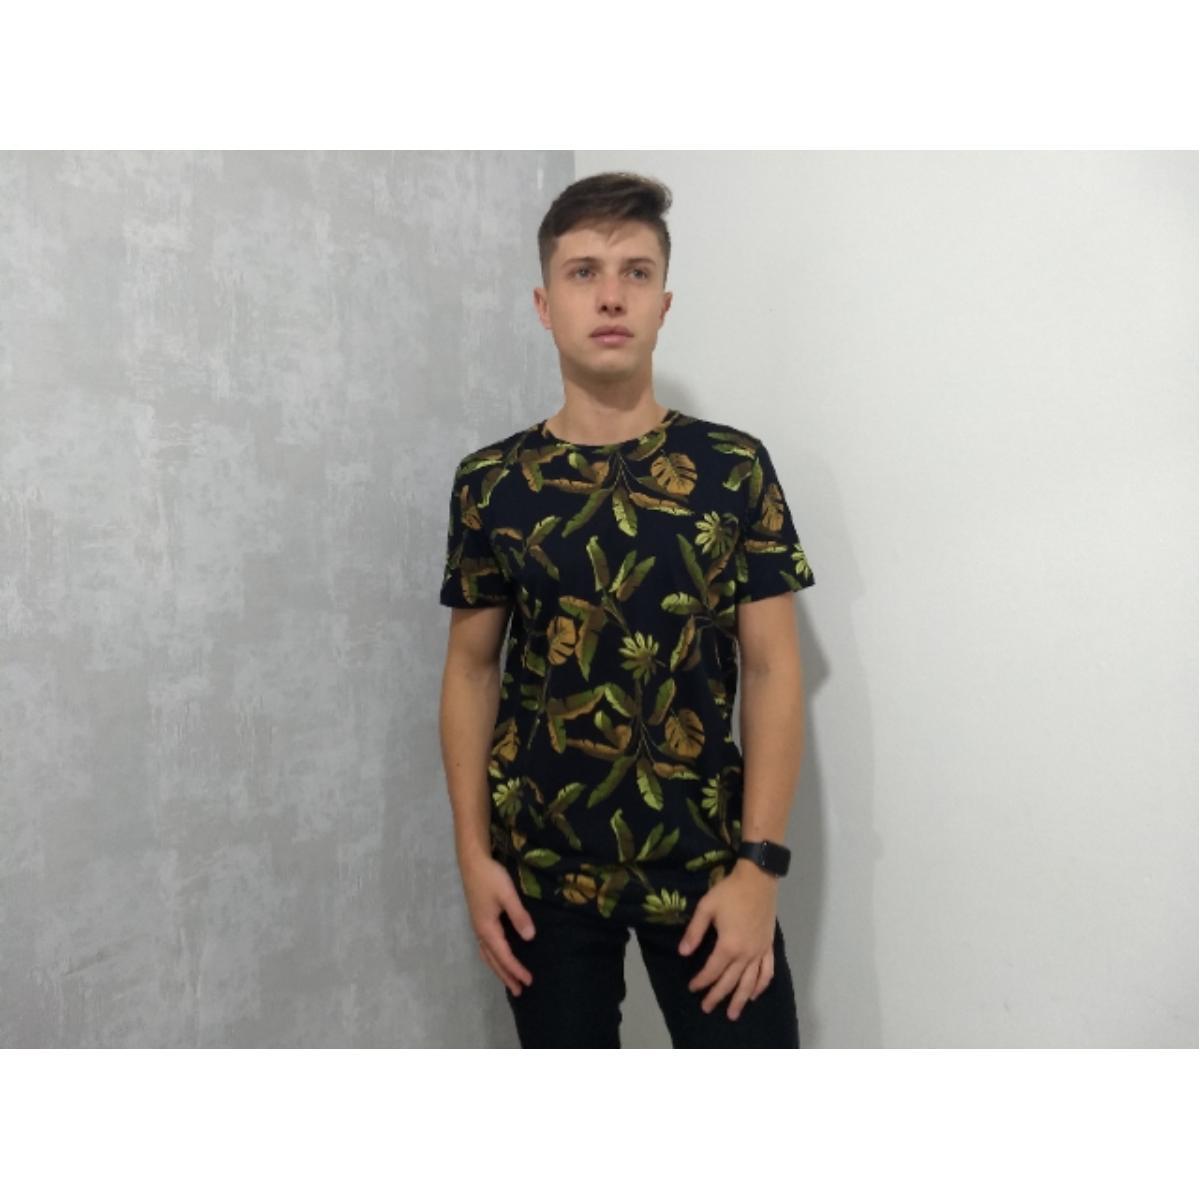 Camiseta Masculina Colcci 350108669 Vc28 Preto Floral